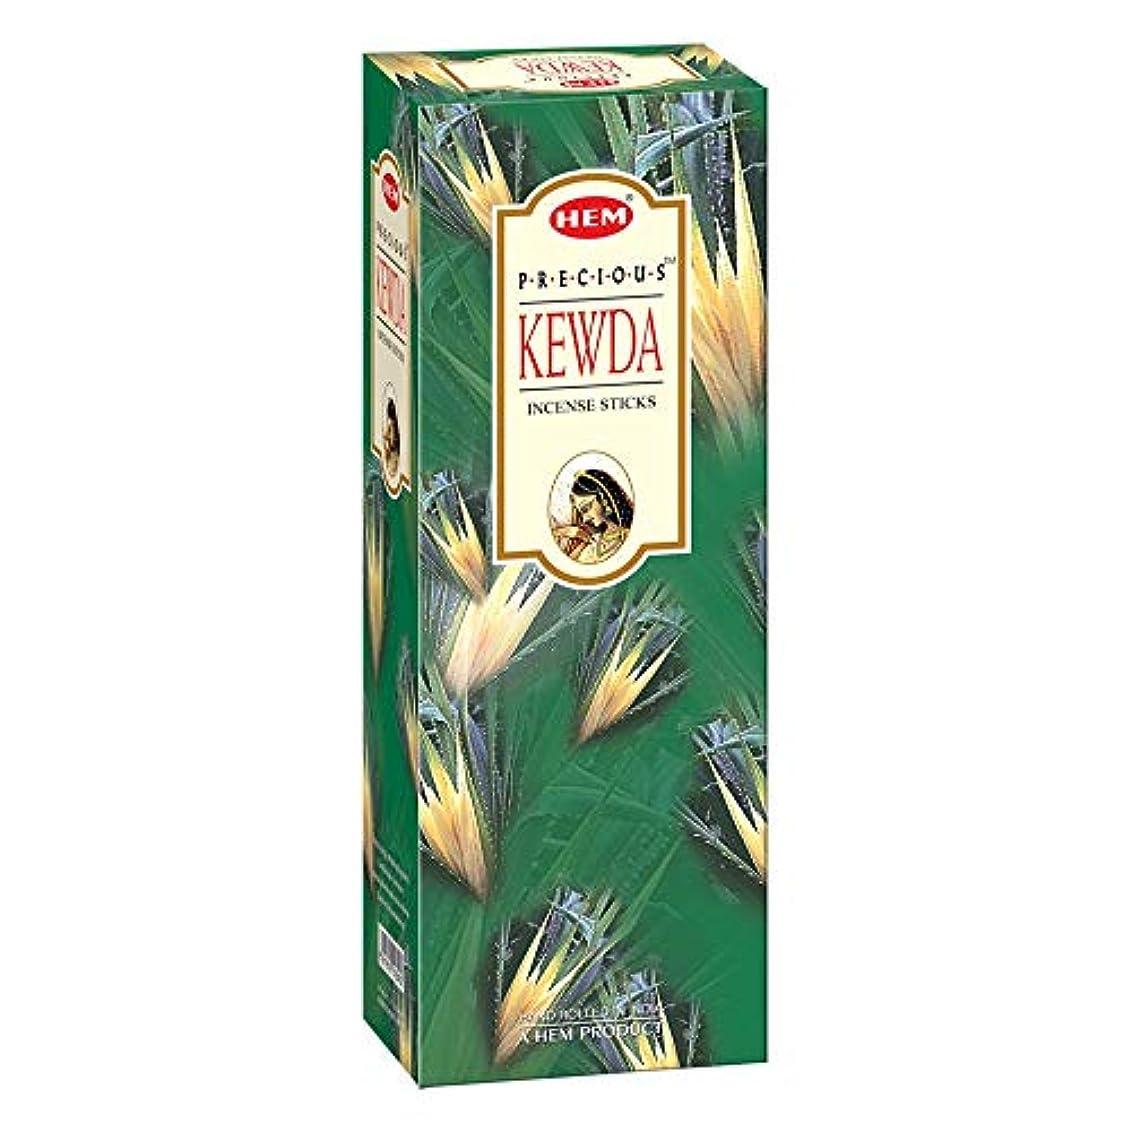 試用すき病的Hem Precious Kewda Incense Sticks(9.3 cm X 6.0 cm X 25.5cm, Black)